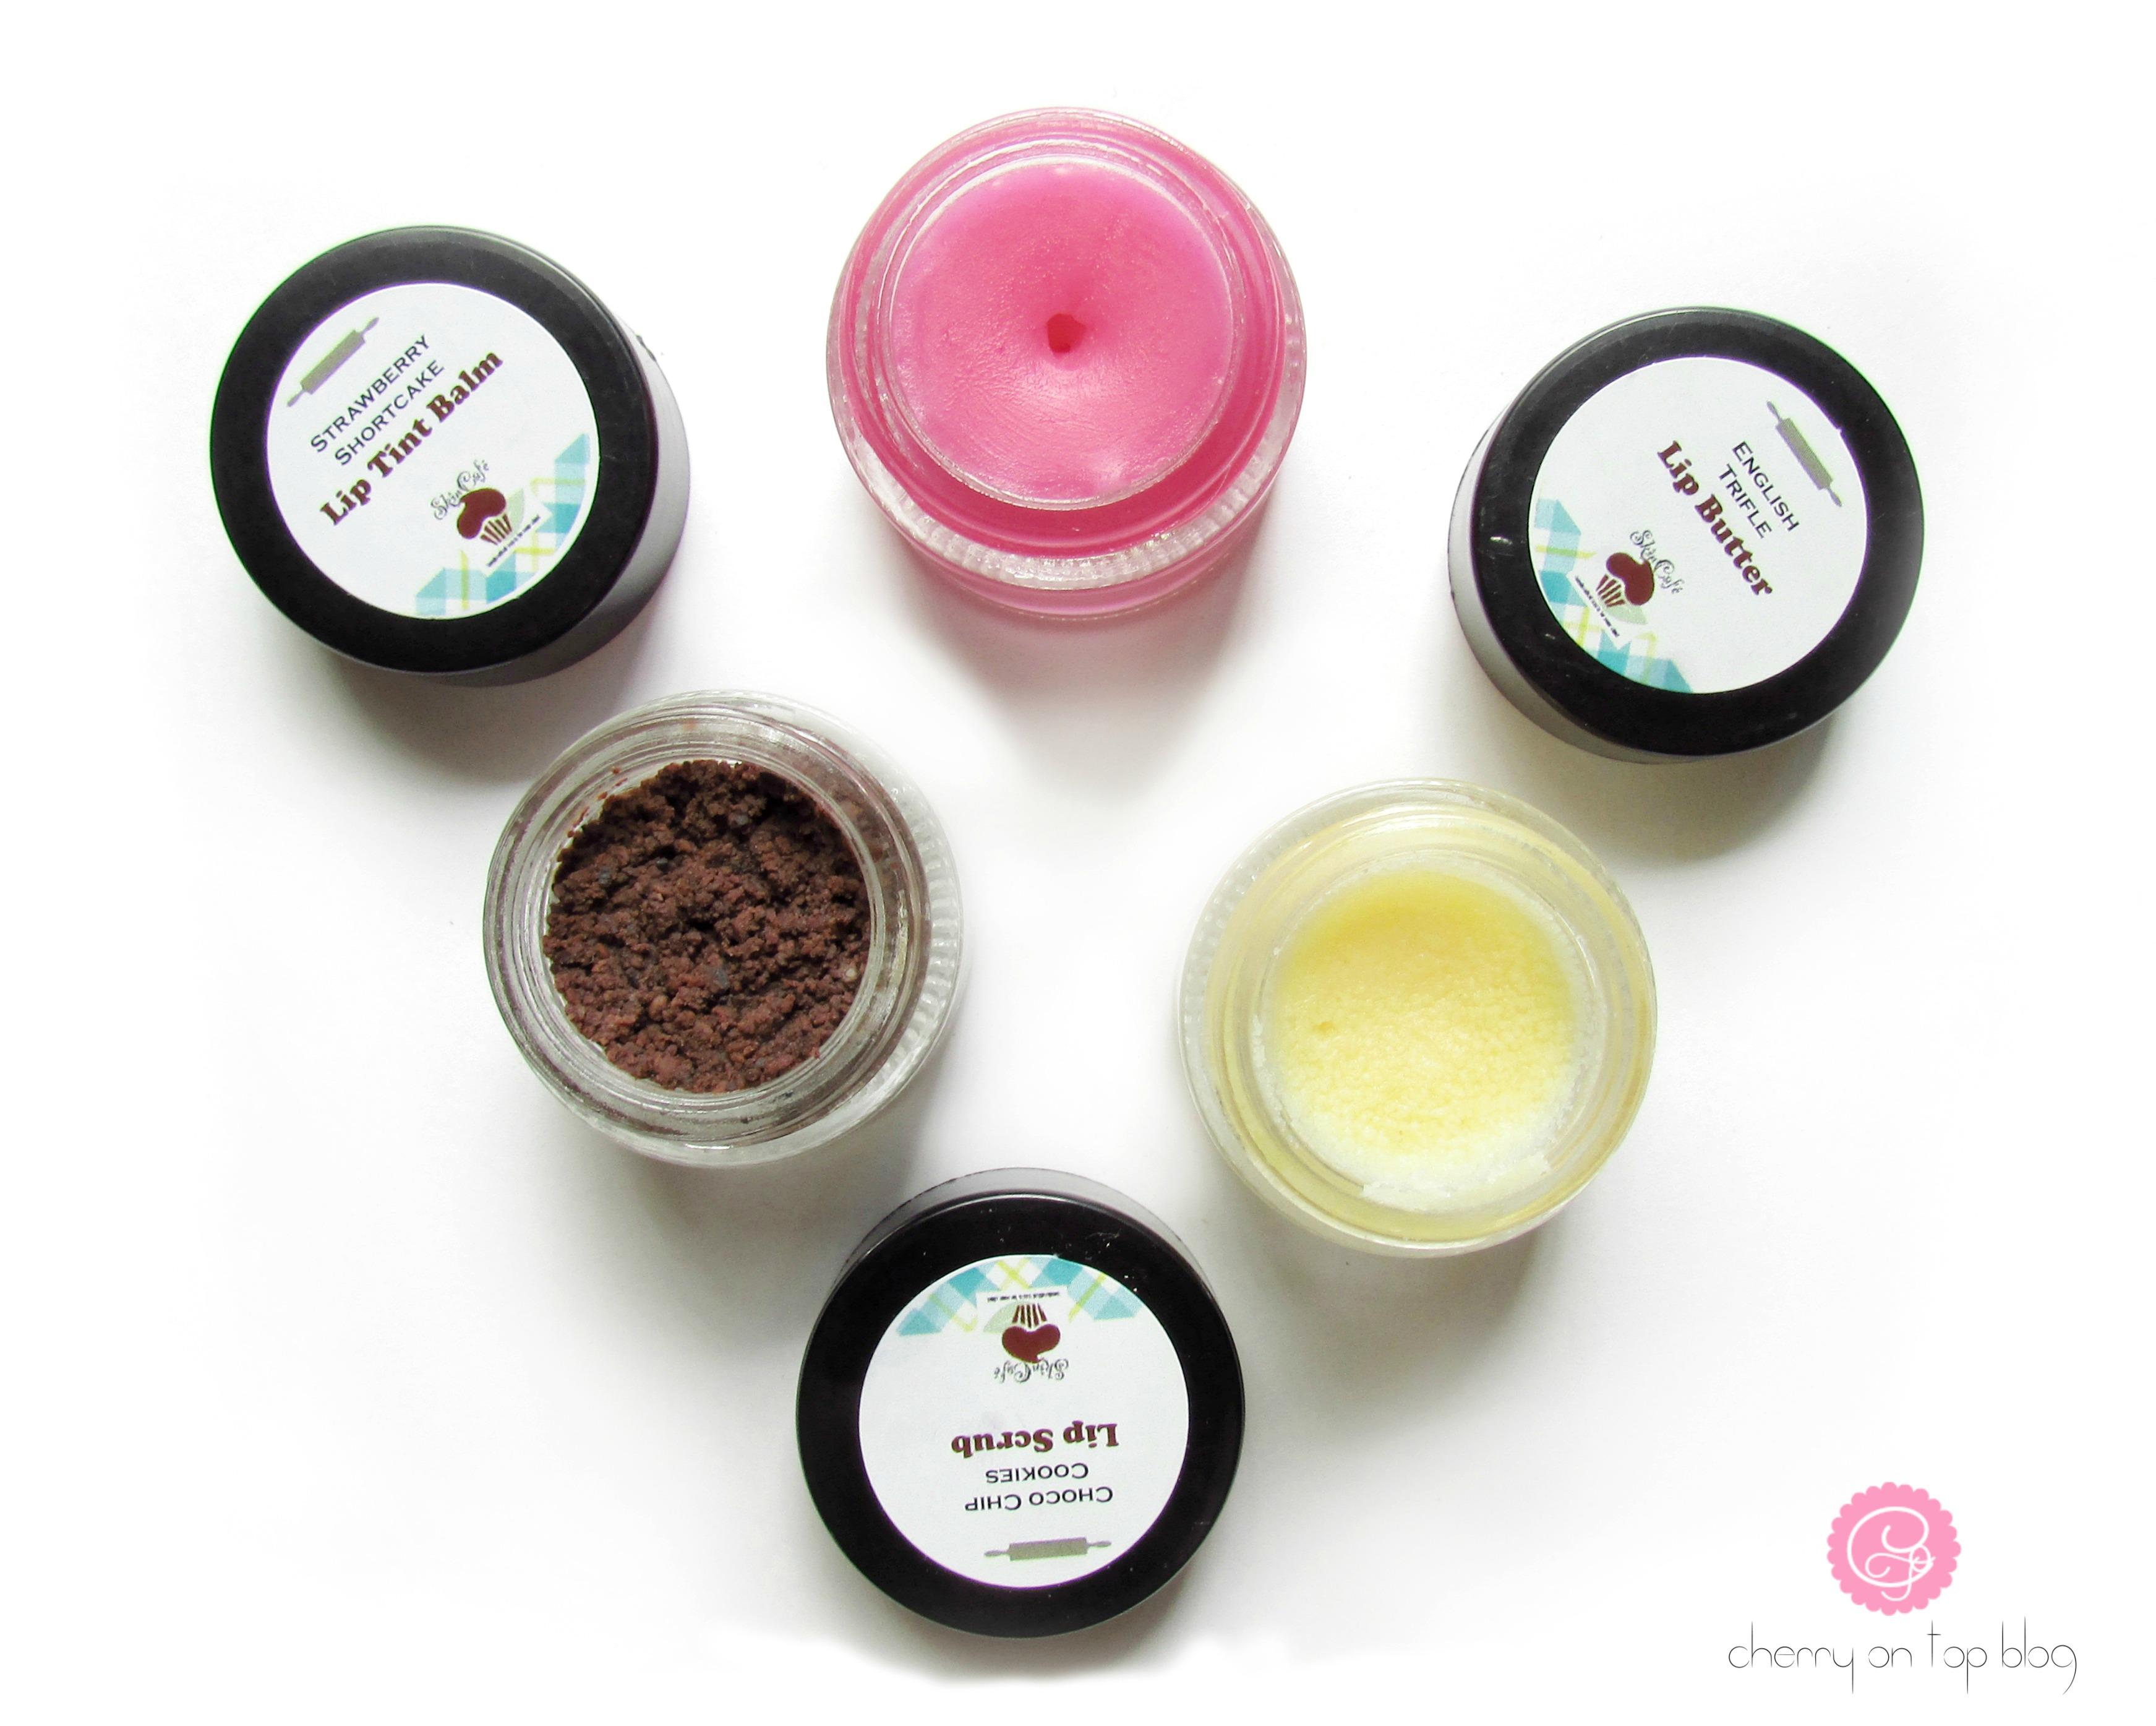 SkinCafe Lip Care Range- Scrub, Butter & Tinted Balm Review| cherryontopblog.com